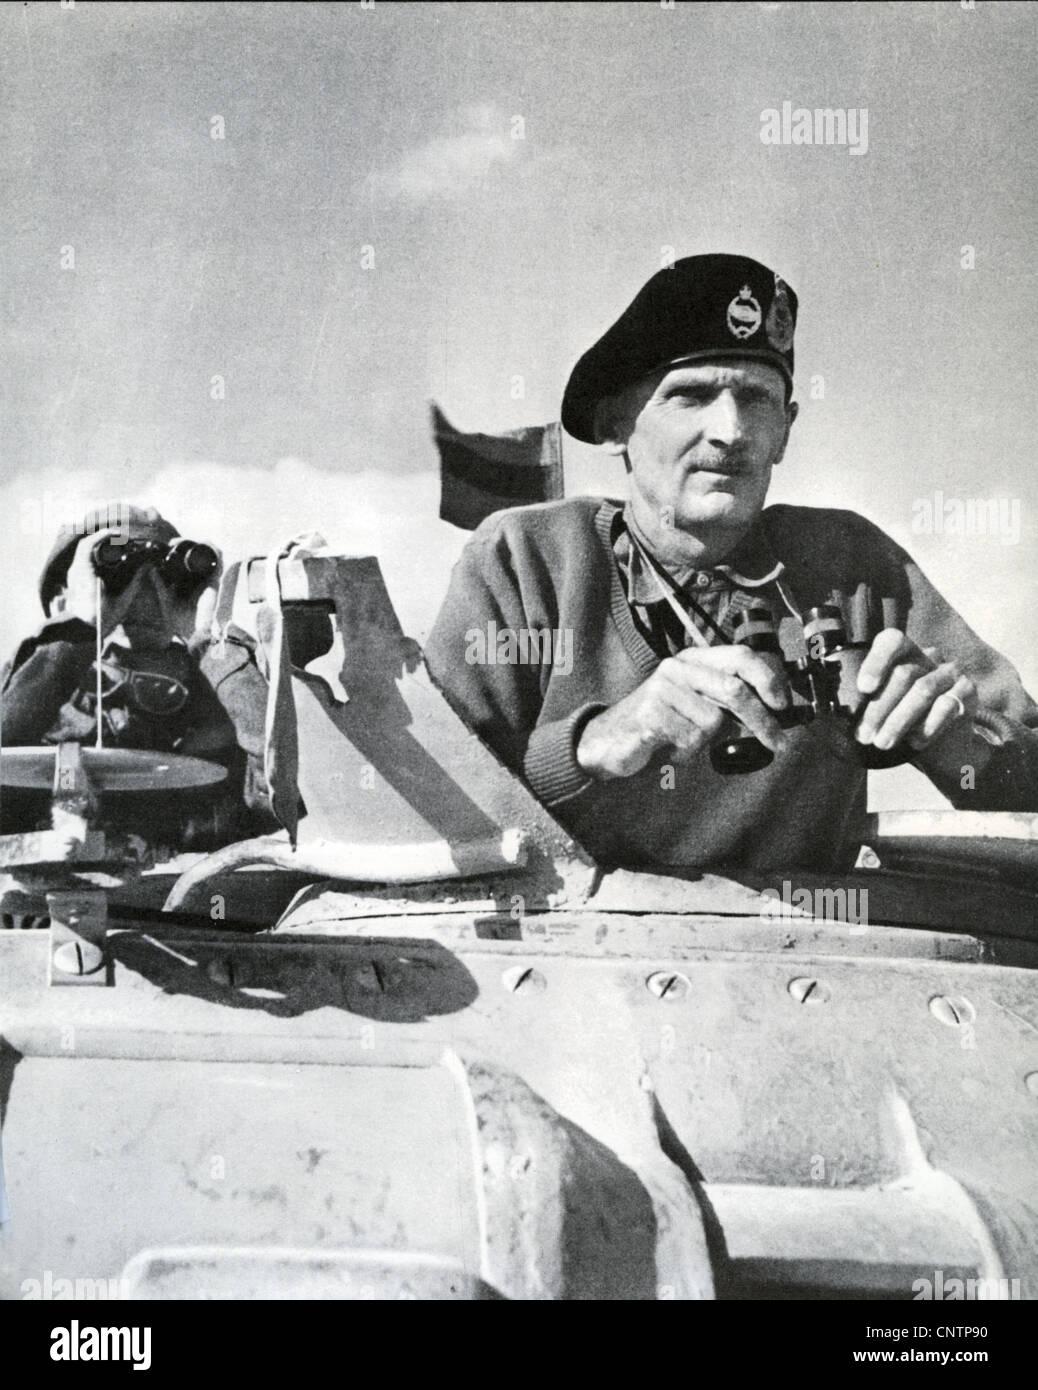 FIELD MARSHALL BERNARD MONTGOMERY (1887-1976) in the North African desert in 1942 - Stock Image